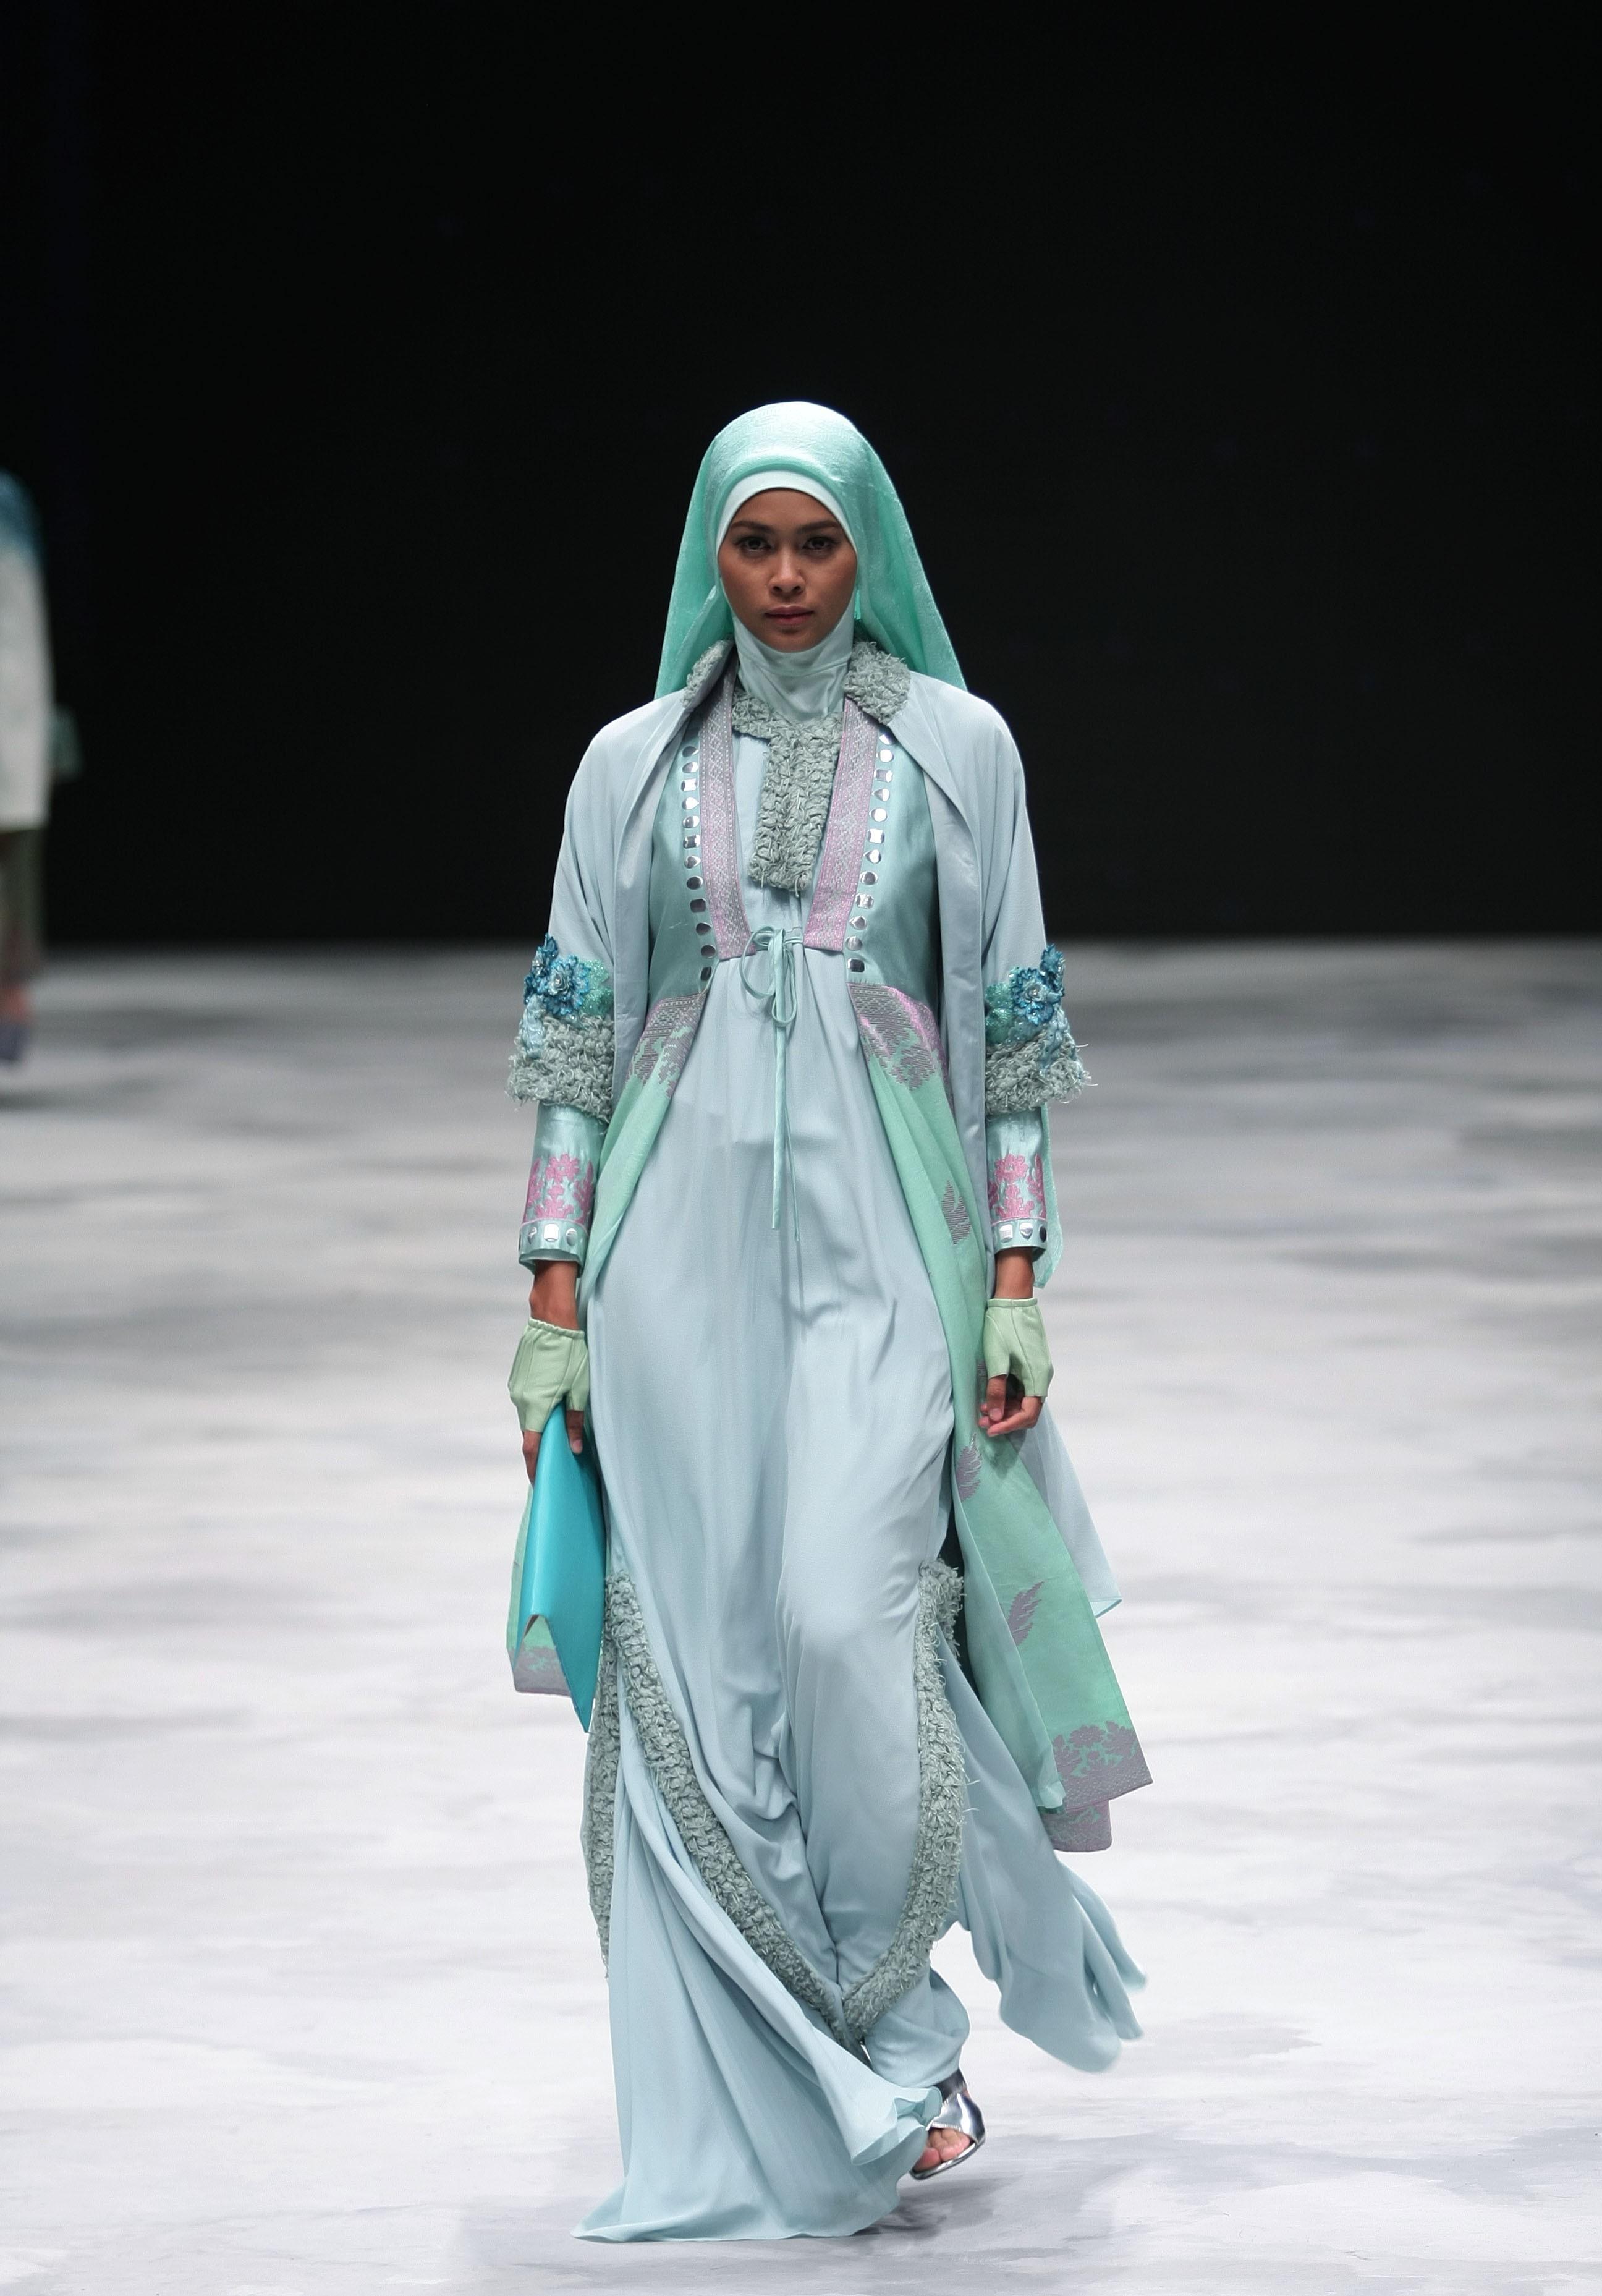 Gamis unik turquoise